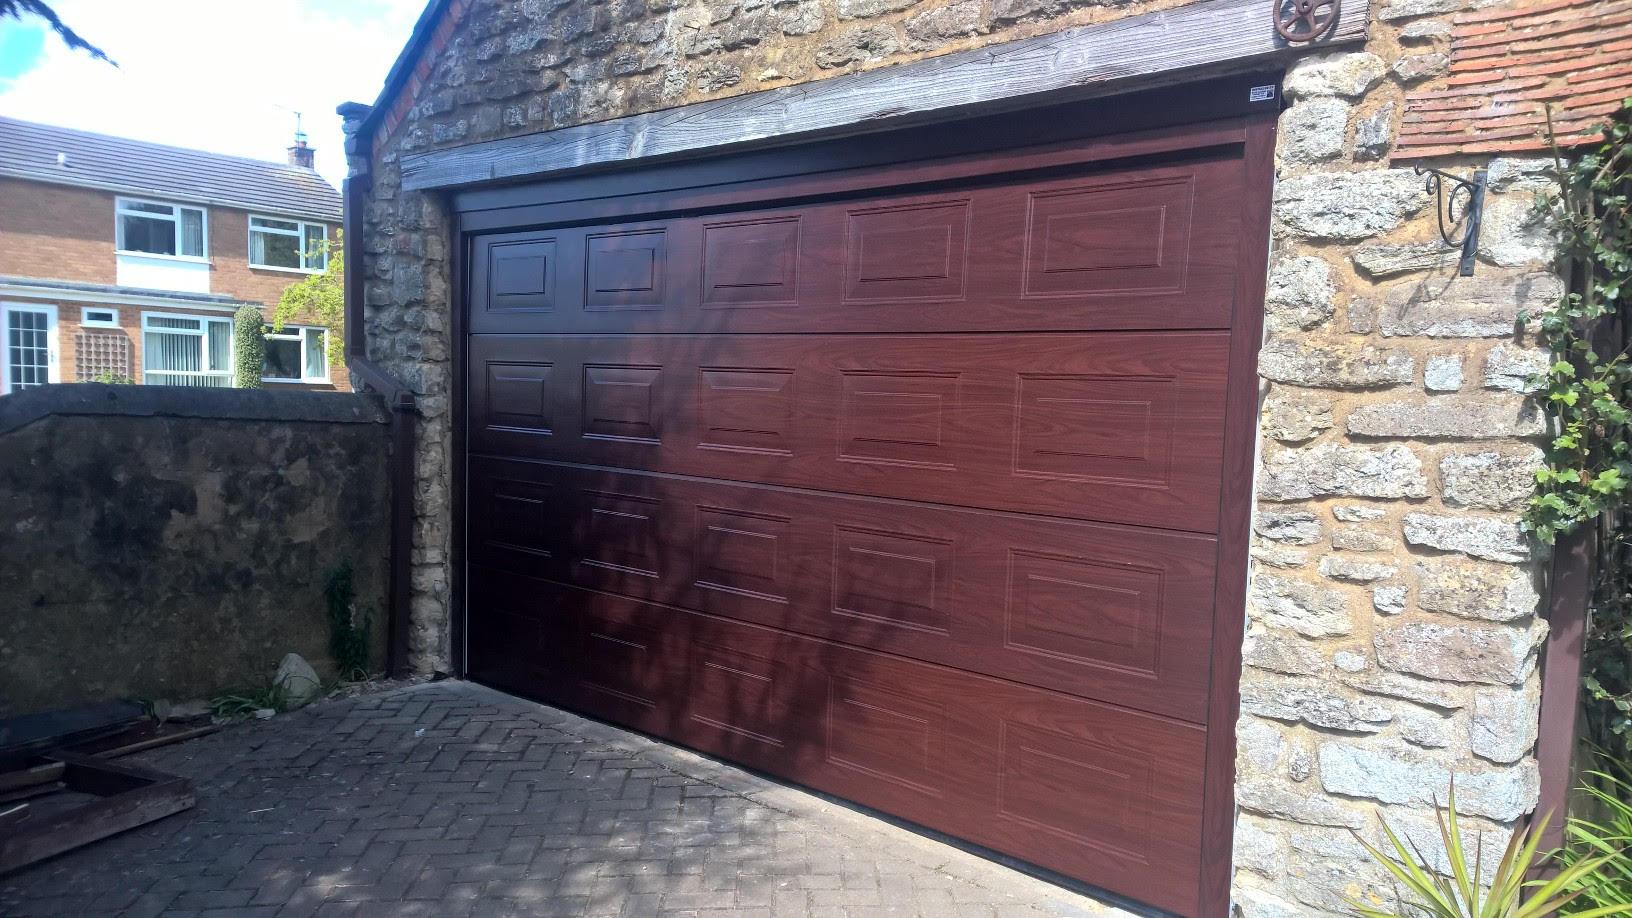 novoferm iso 45 panelled sectional garage door in rosewood. Black Bedroom Furniture Sets. Home Design Ideas